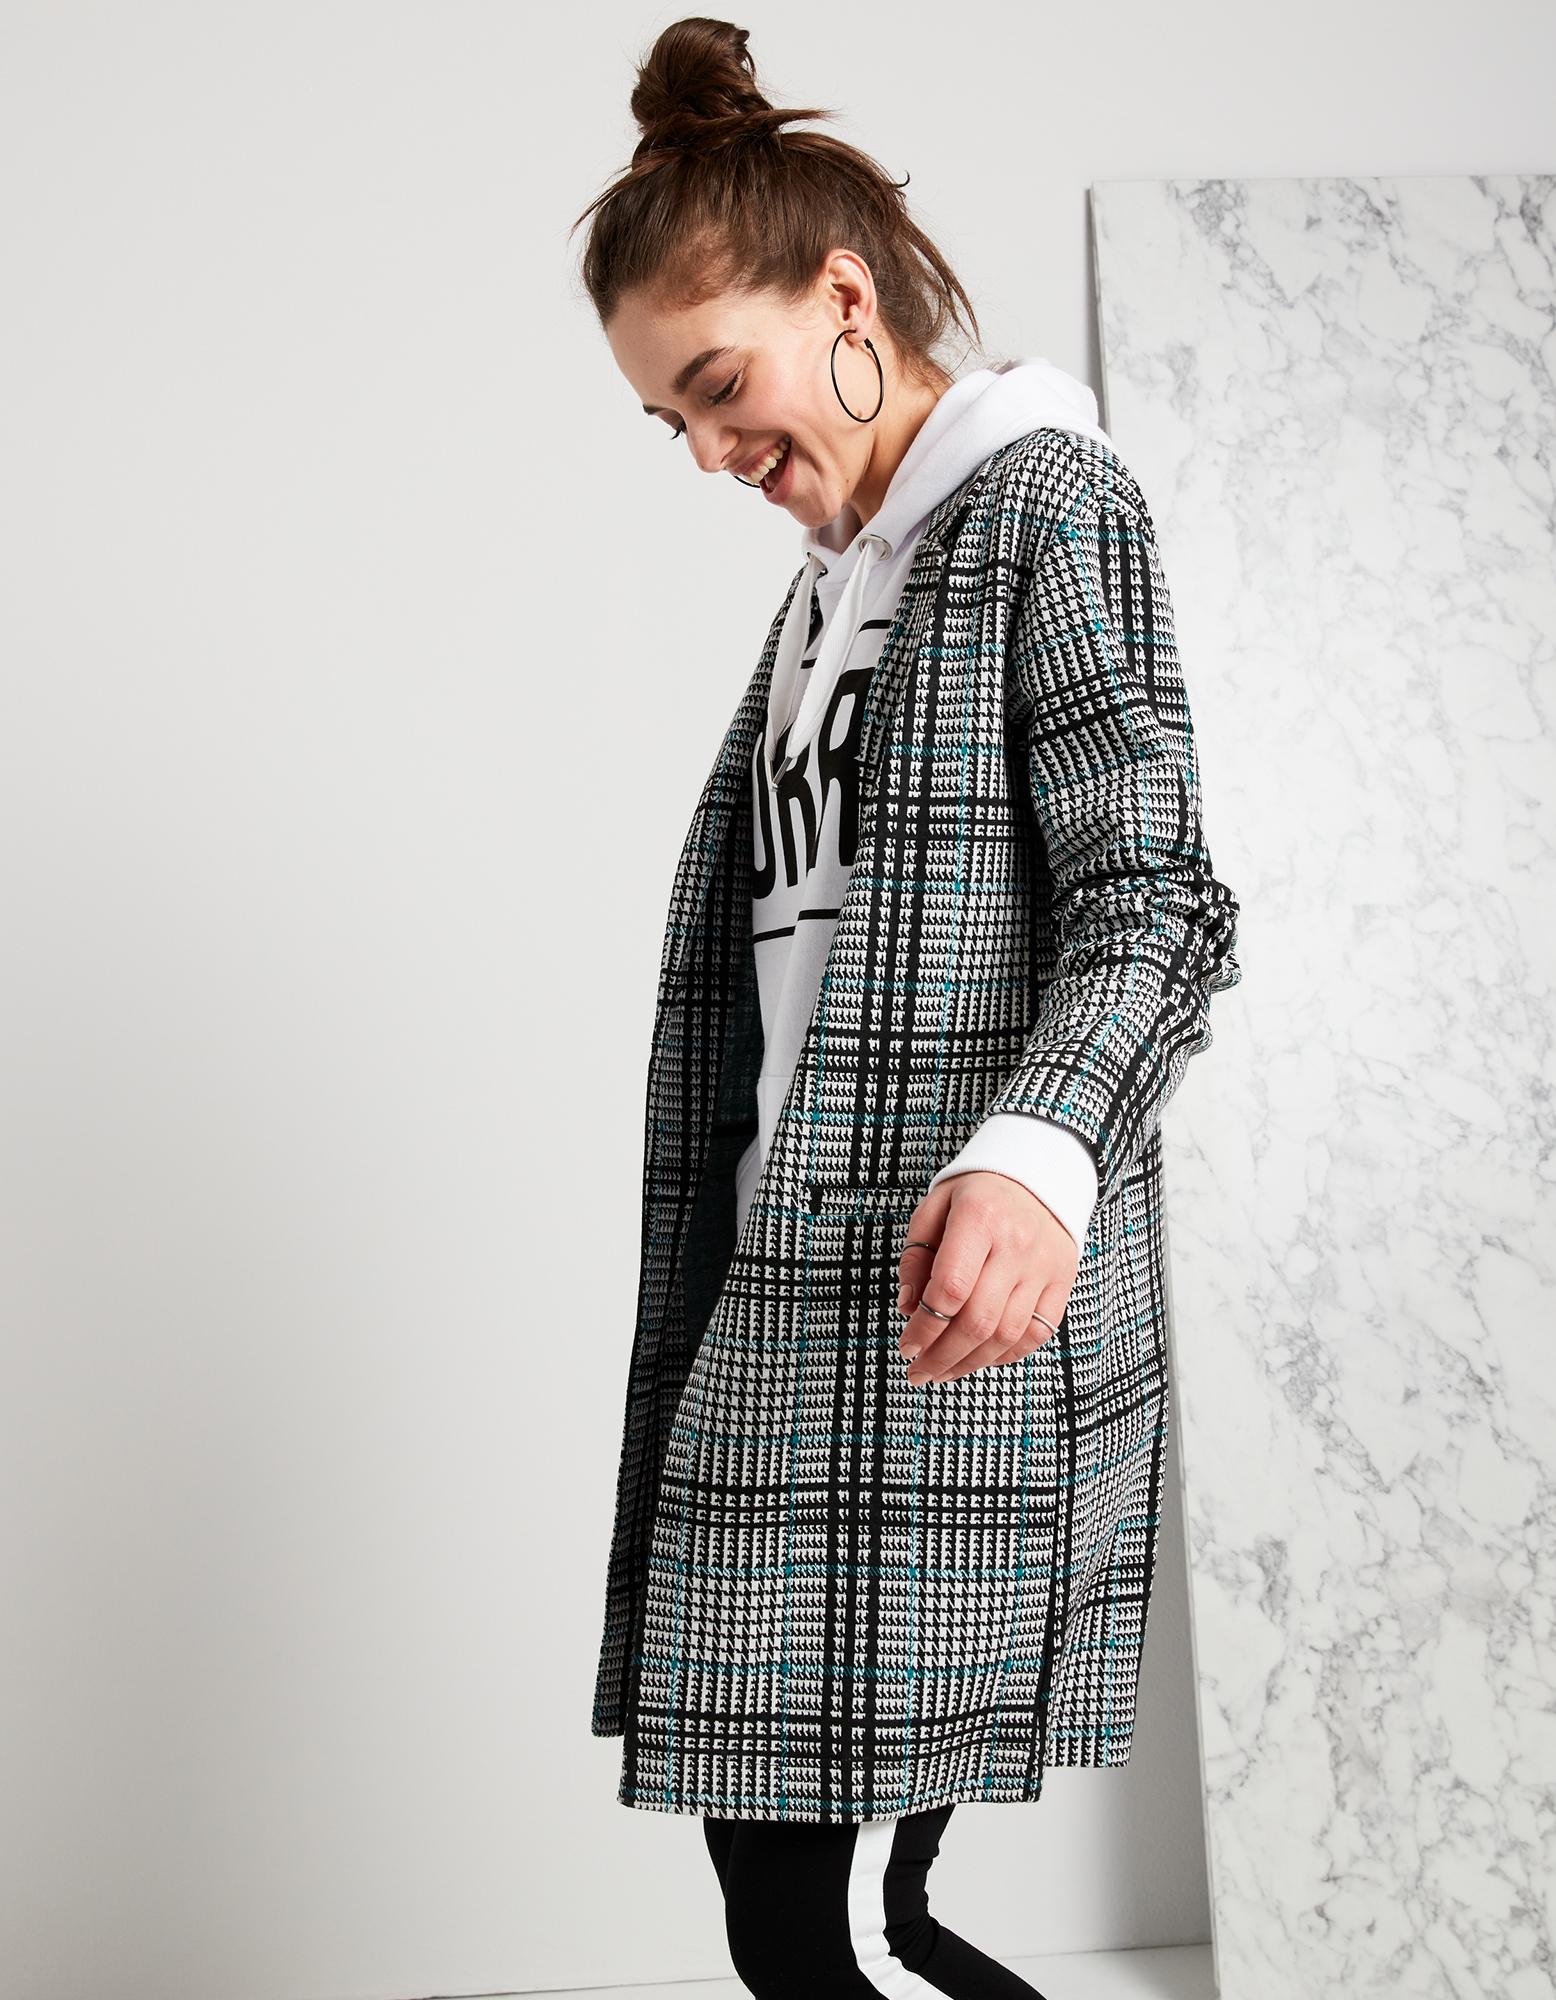 Damen Mantel mit Glencheck Takko Fashion